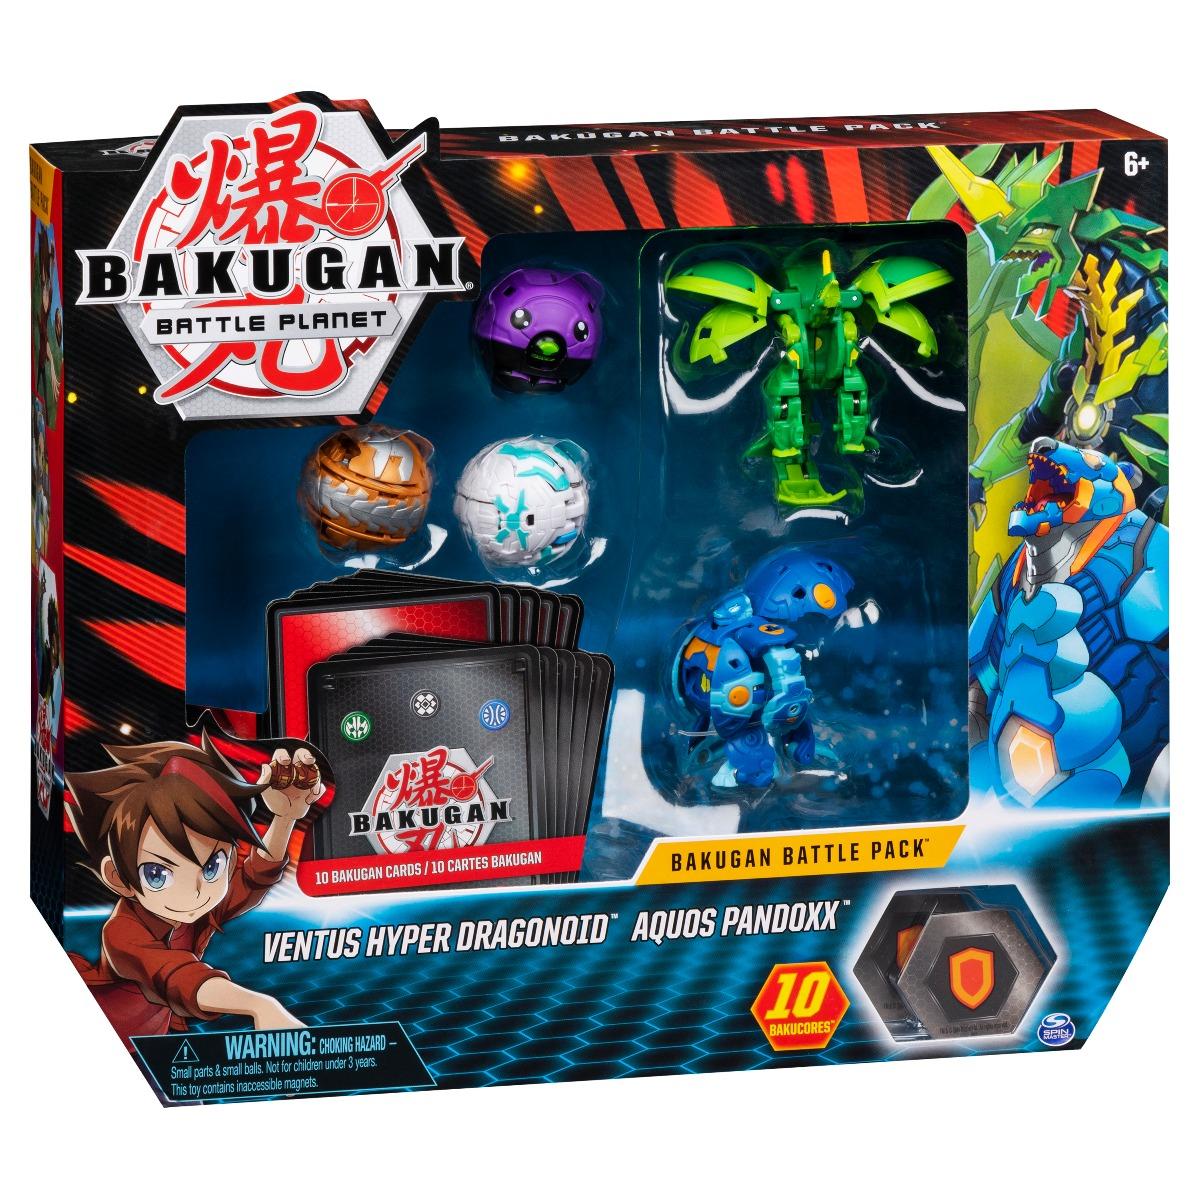 Set 5 Bakugan Battle Planet, Ventus Hyper Dragonoid, Aquos Pandoxx, 20115628 imagine